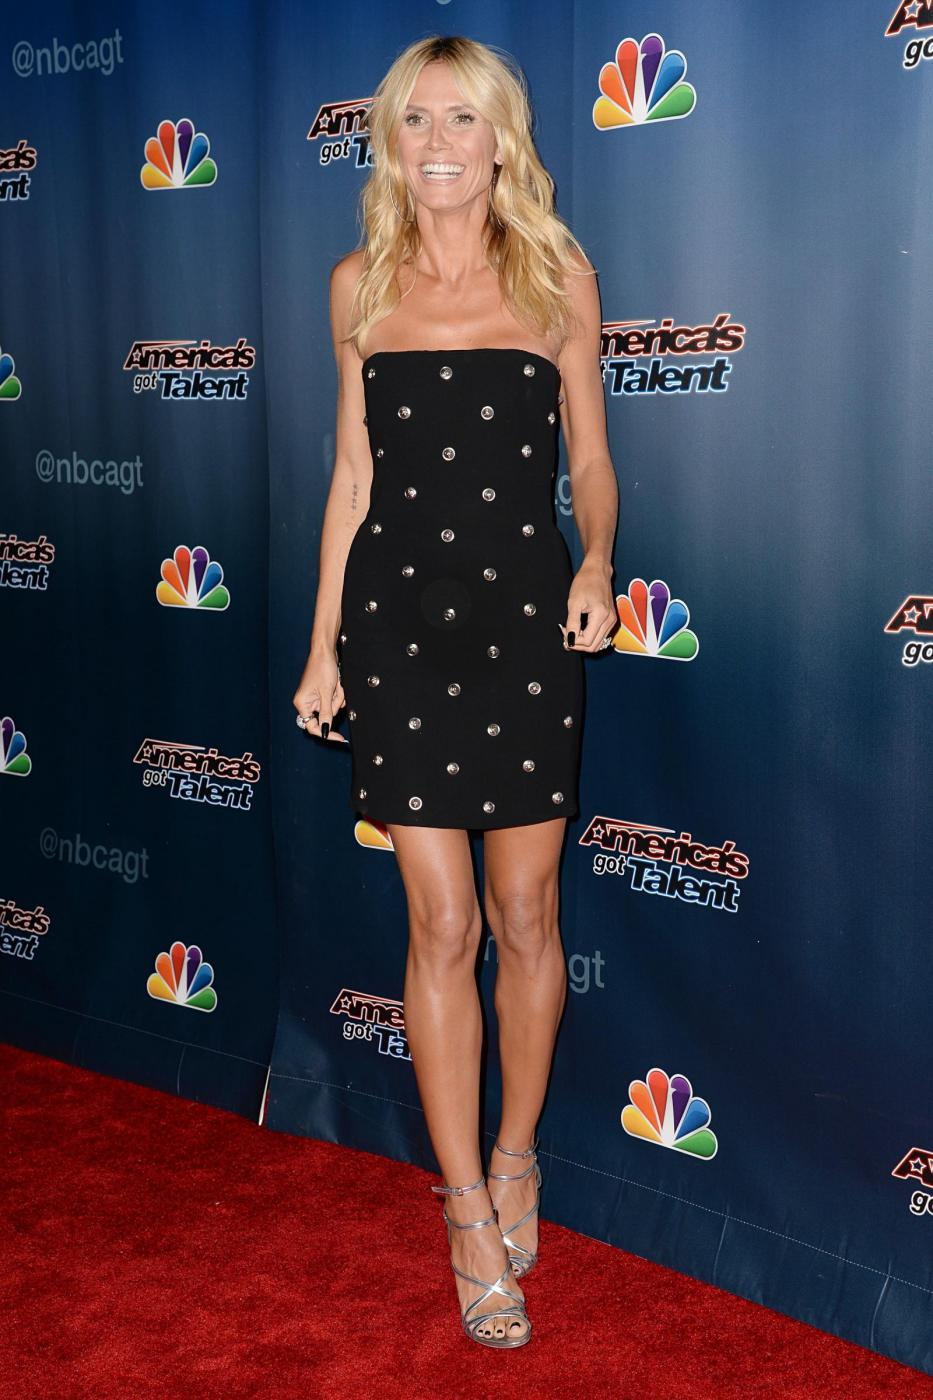 Heidi Klum, mini abito e tacchi per America's Got Talent 8